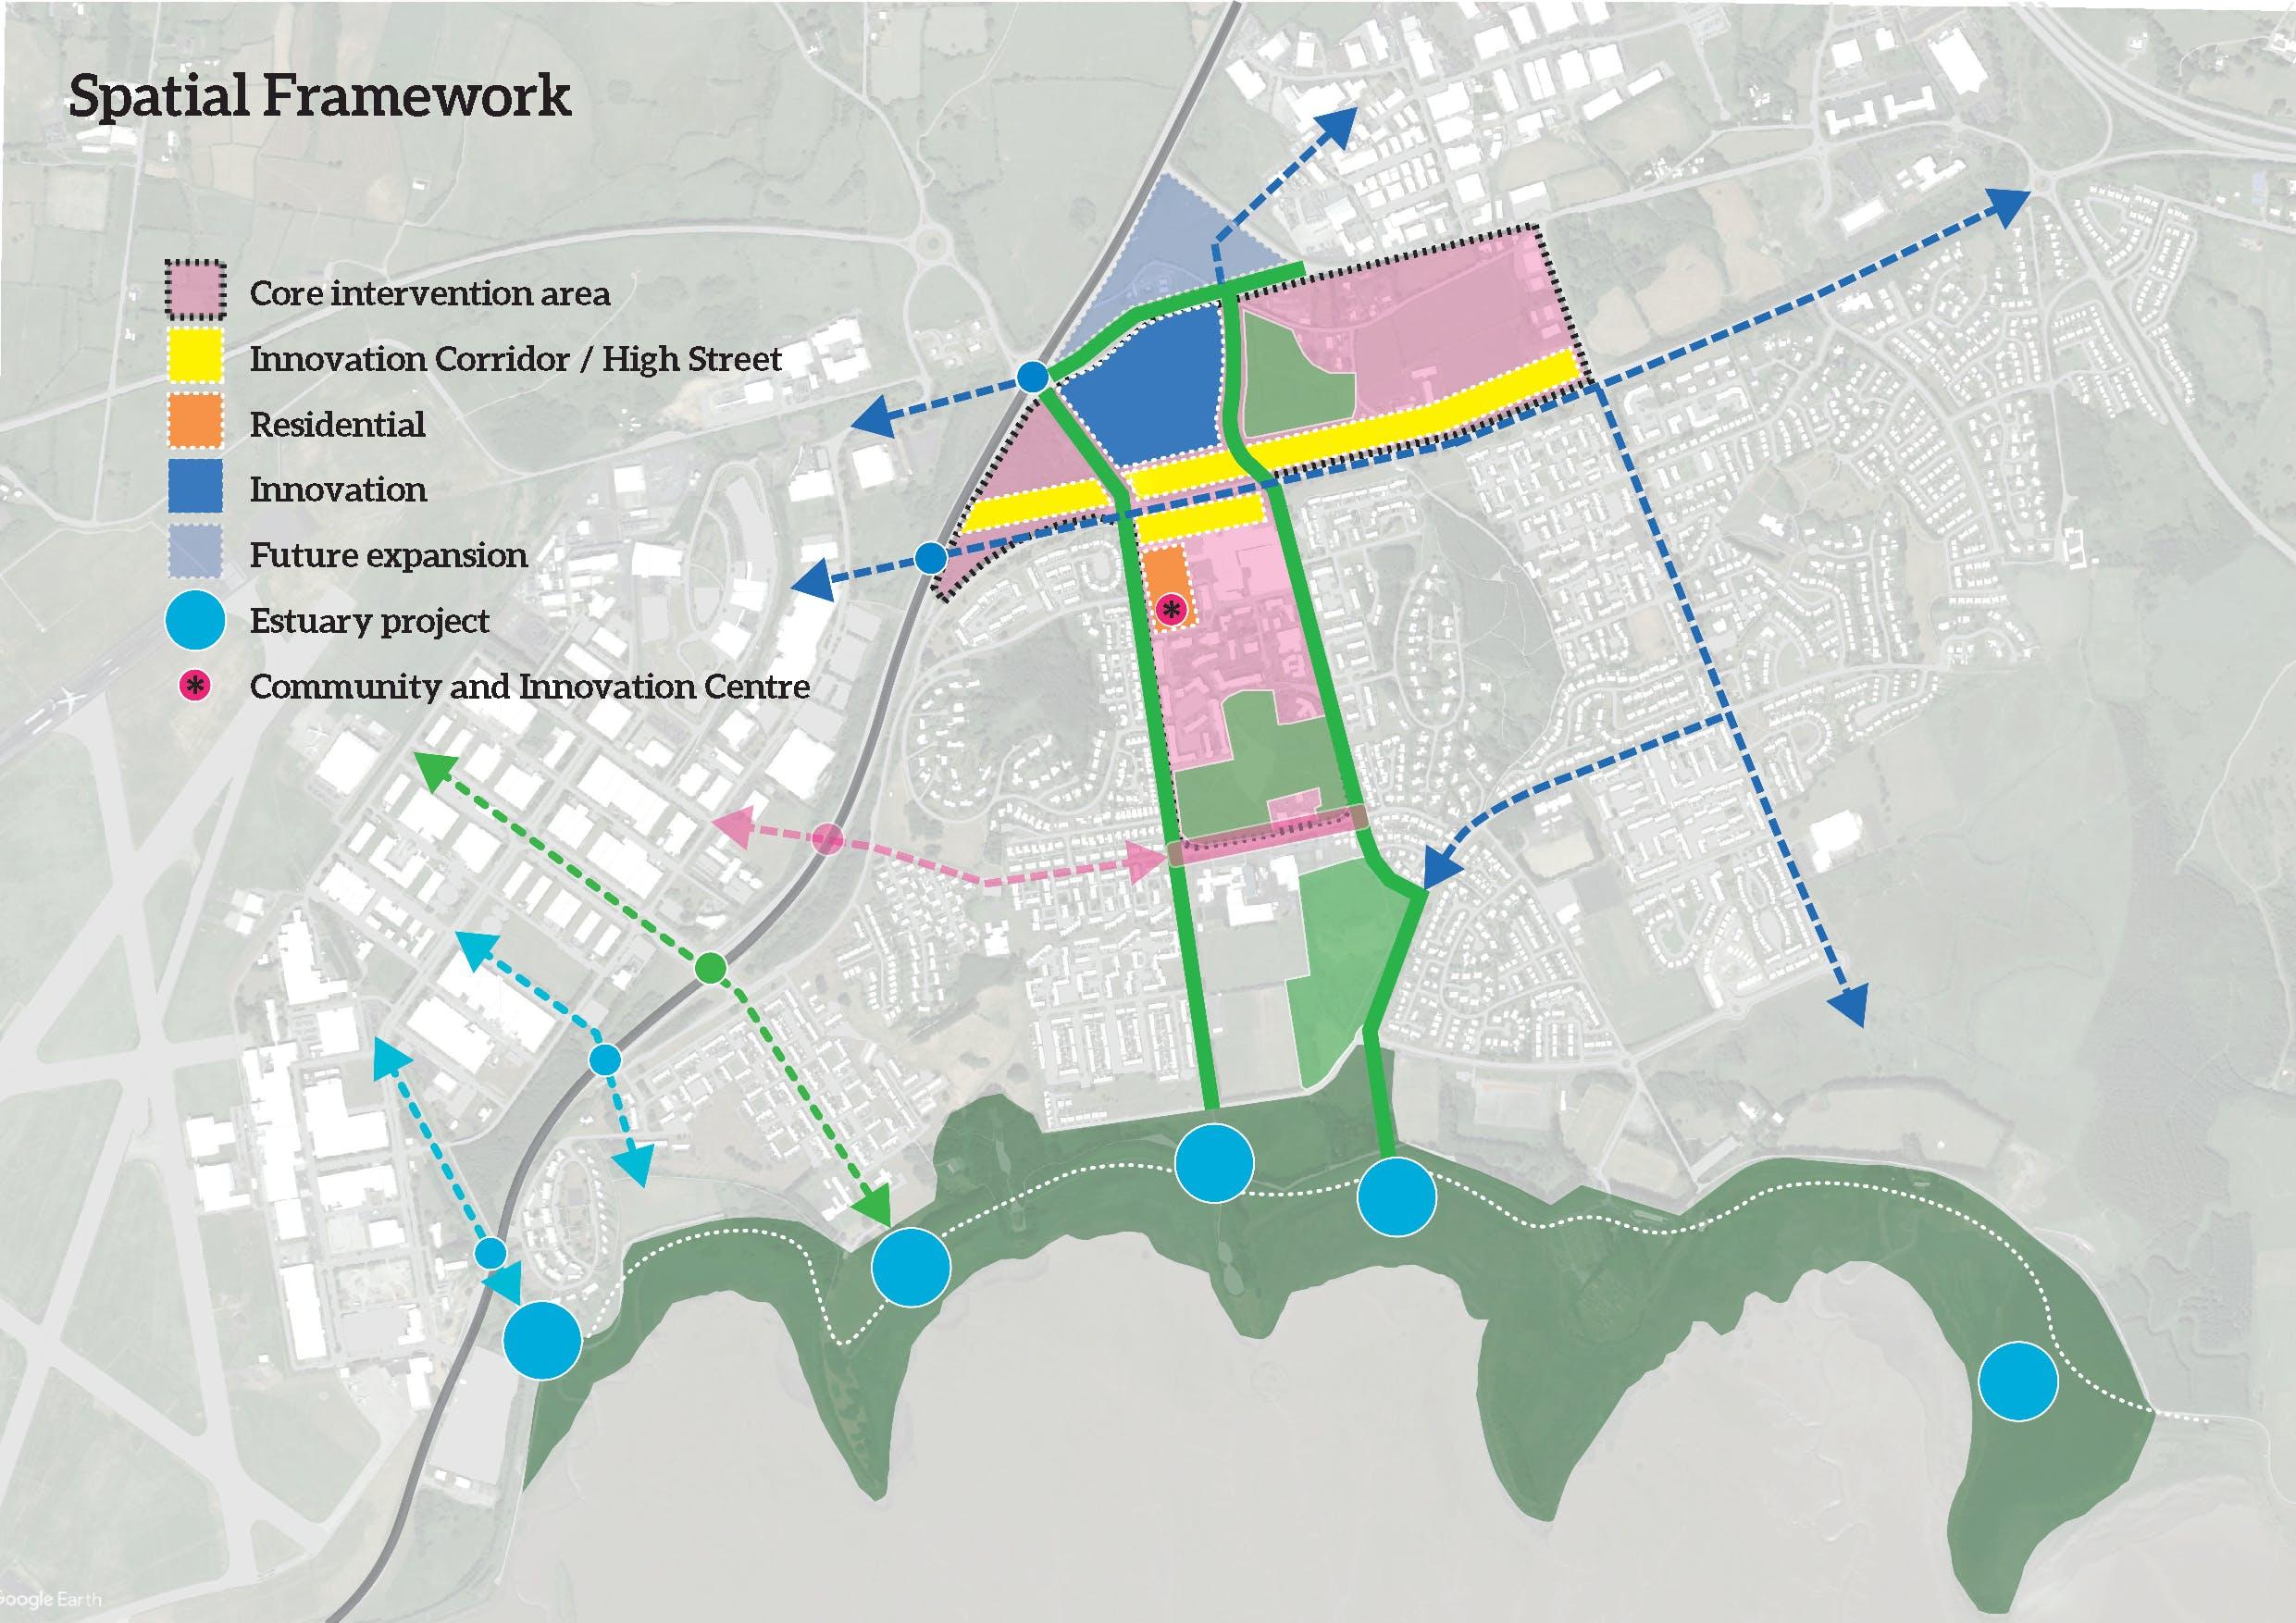 Spatial Framework